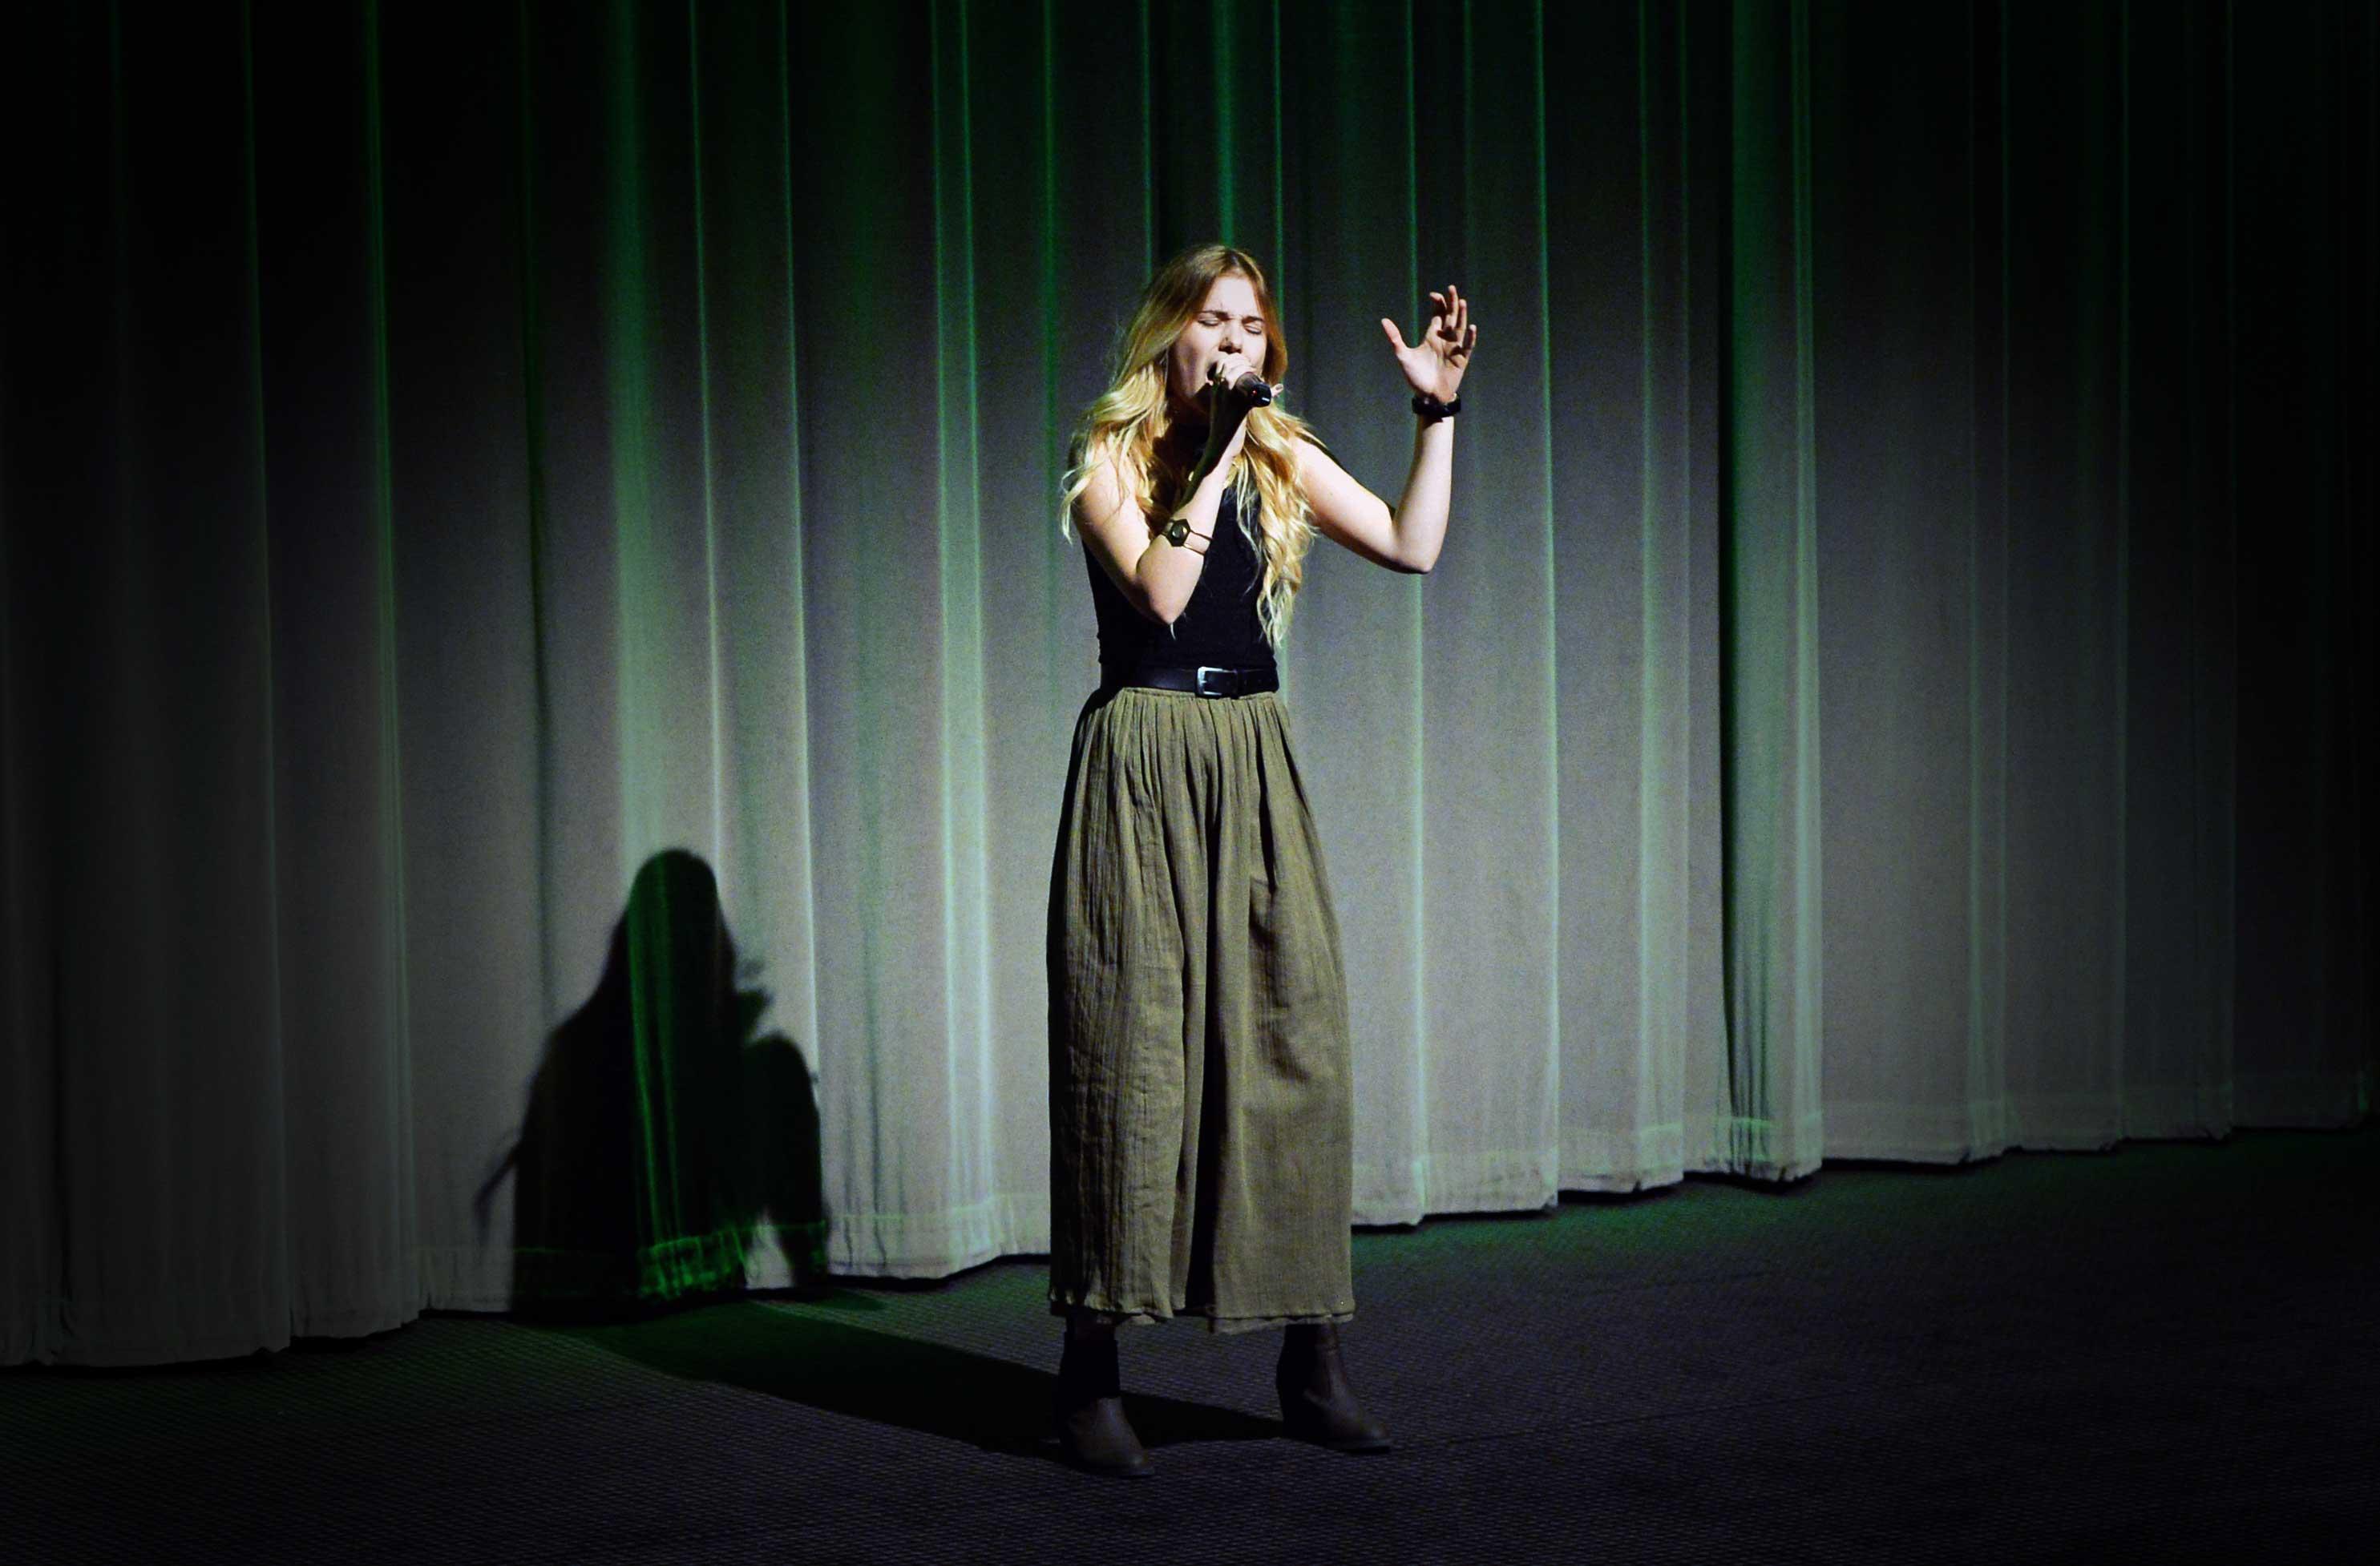 Esther Graf performing Mercedes Benz